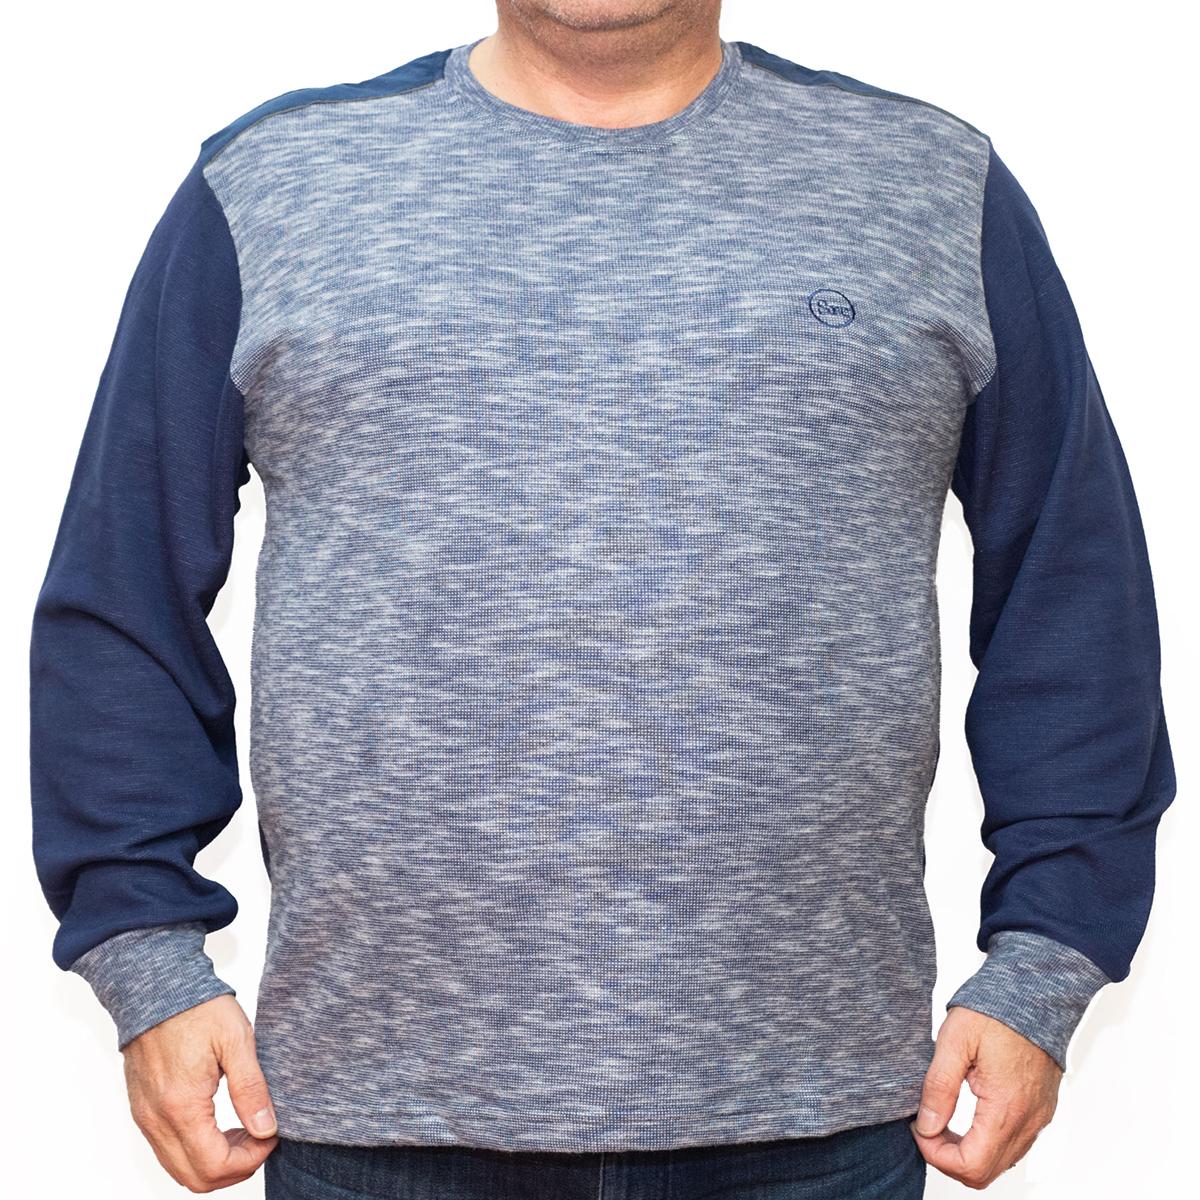 Bluza groasa albastra cu imprimeu la baza gatului , Marime 2XL - egato.ro